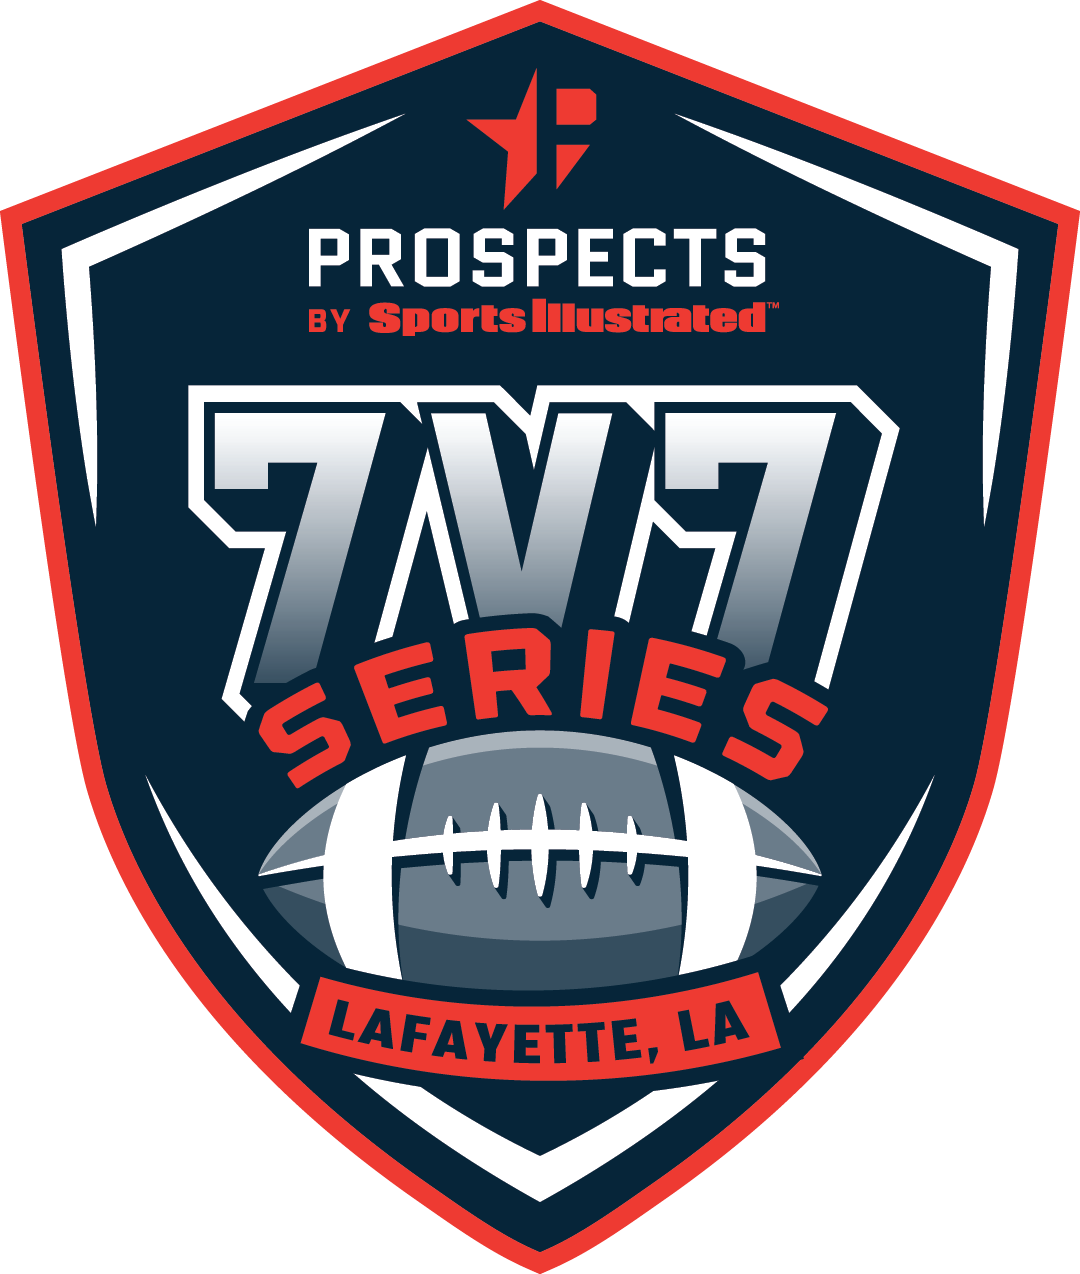 PSI 7 v 7 Series - Lafayette (La.) Regional logo